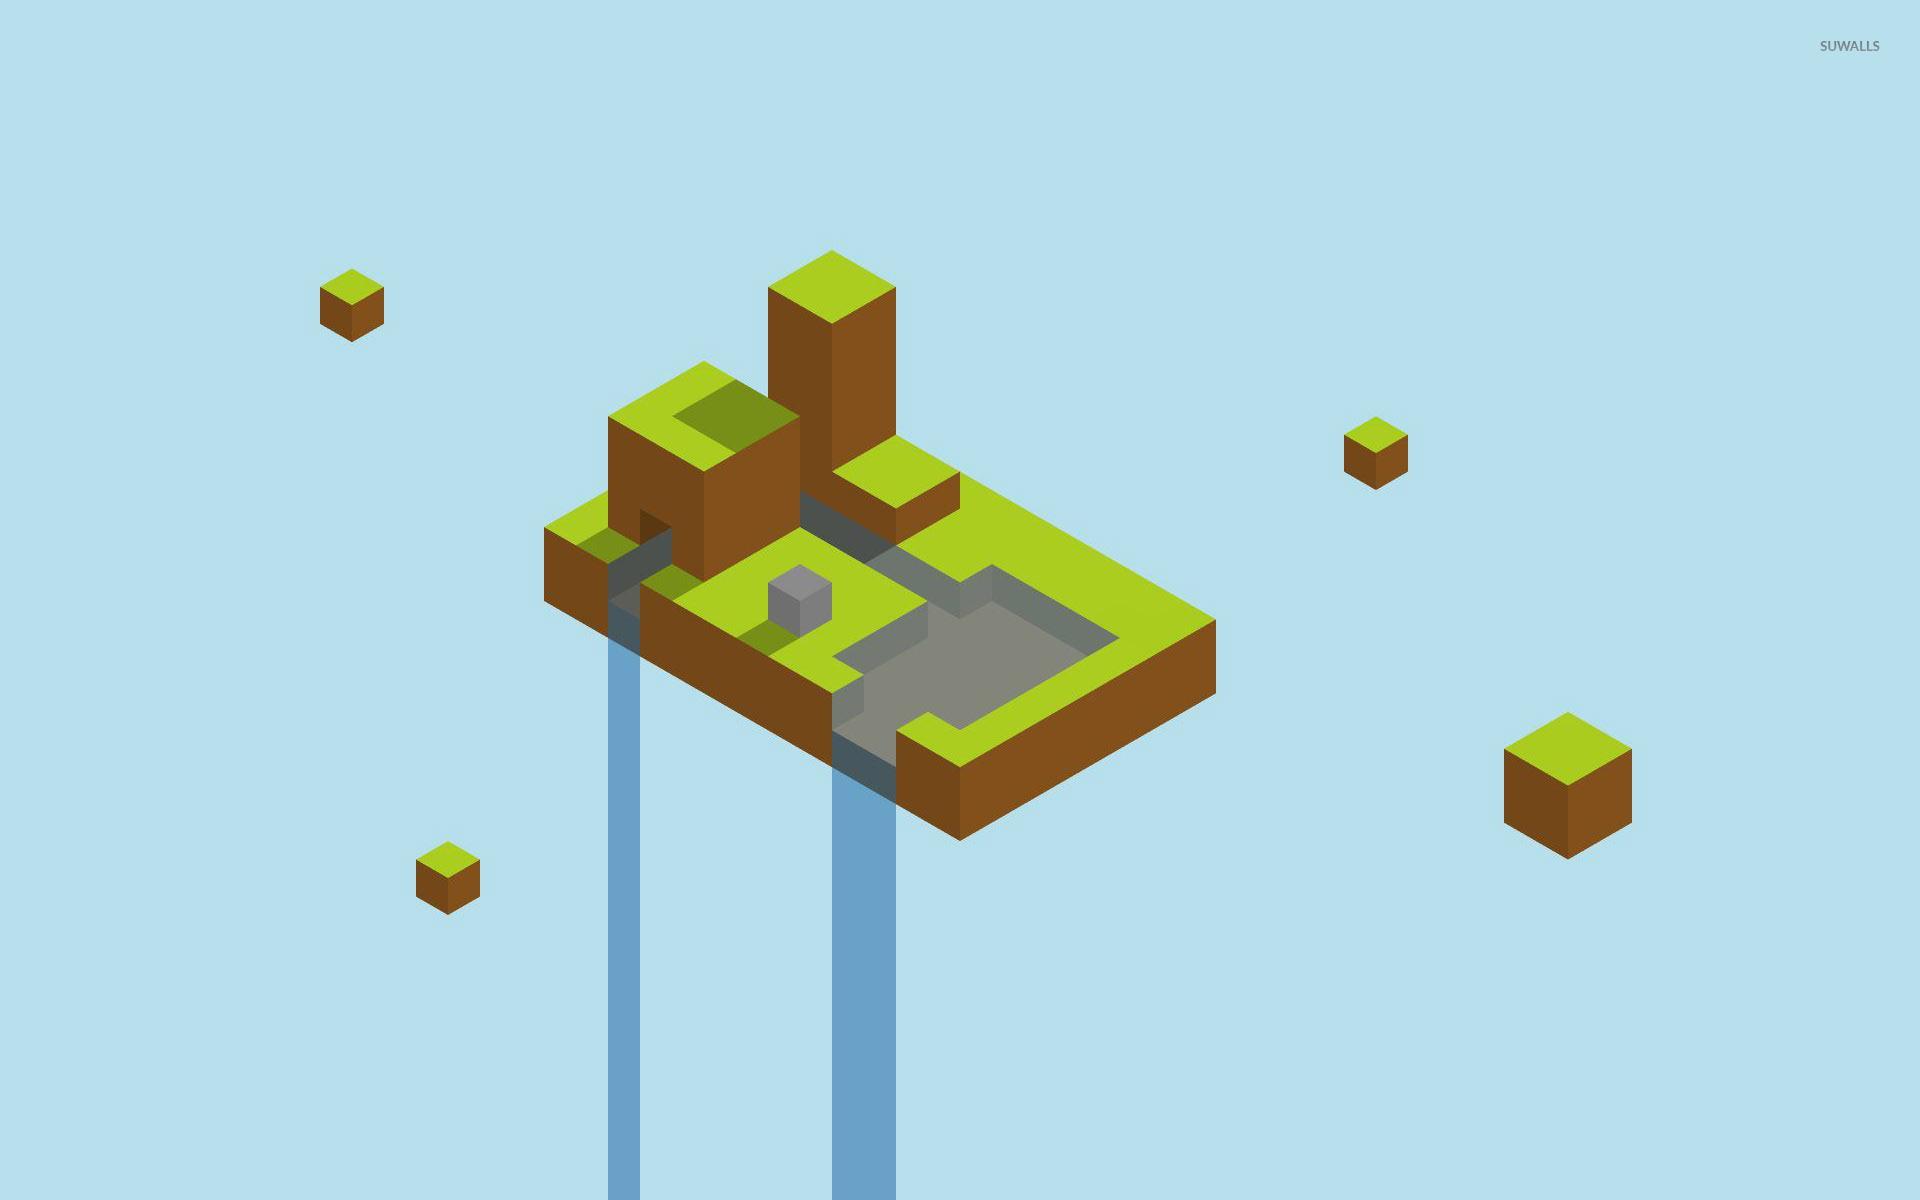 Fantastic Wallpaper Minecraft Minimalistic - floating-minecraft-waterfall-26647-1920x1200  Picture_894020.jpg